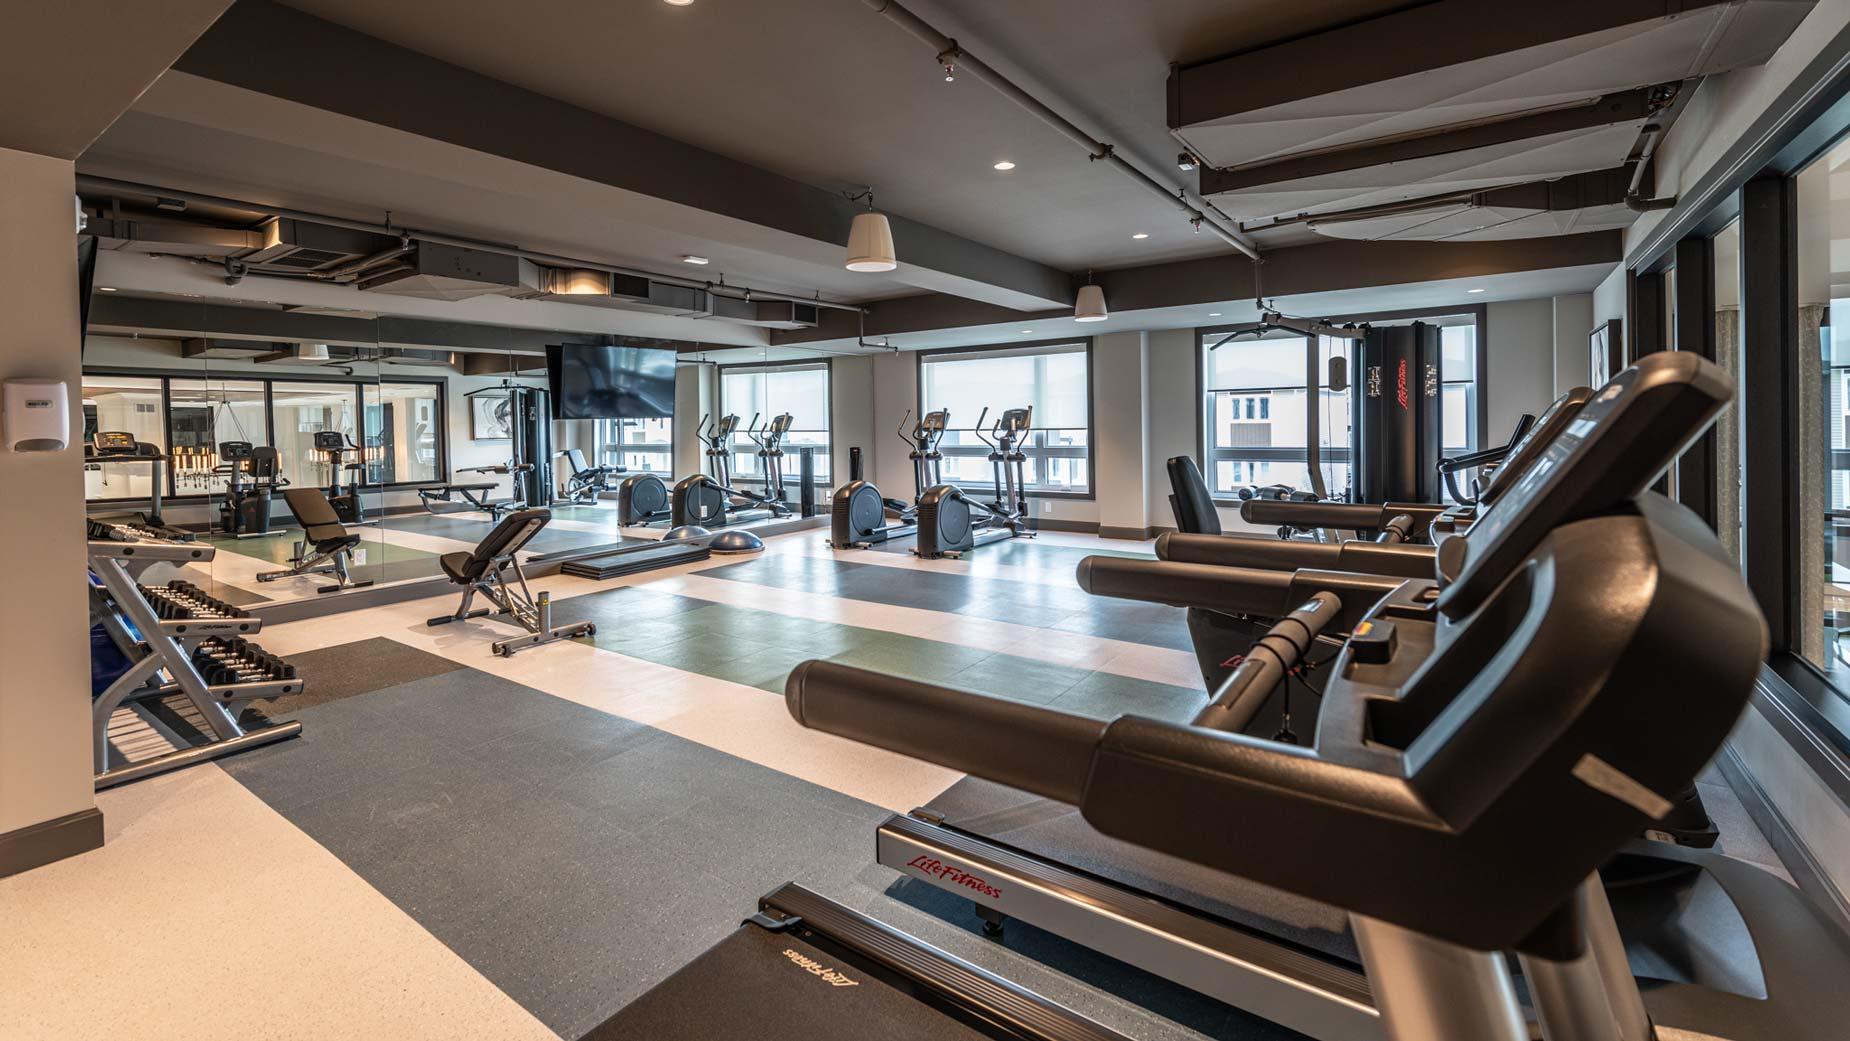 The Williston Fitness Centre